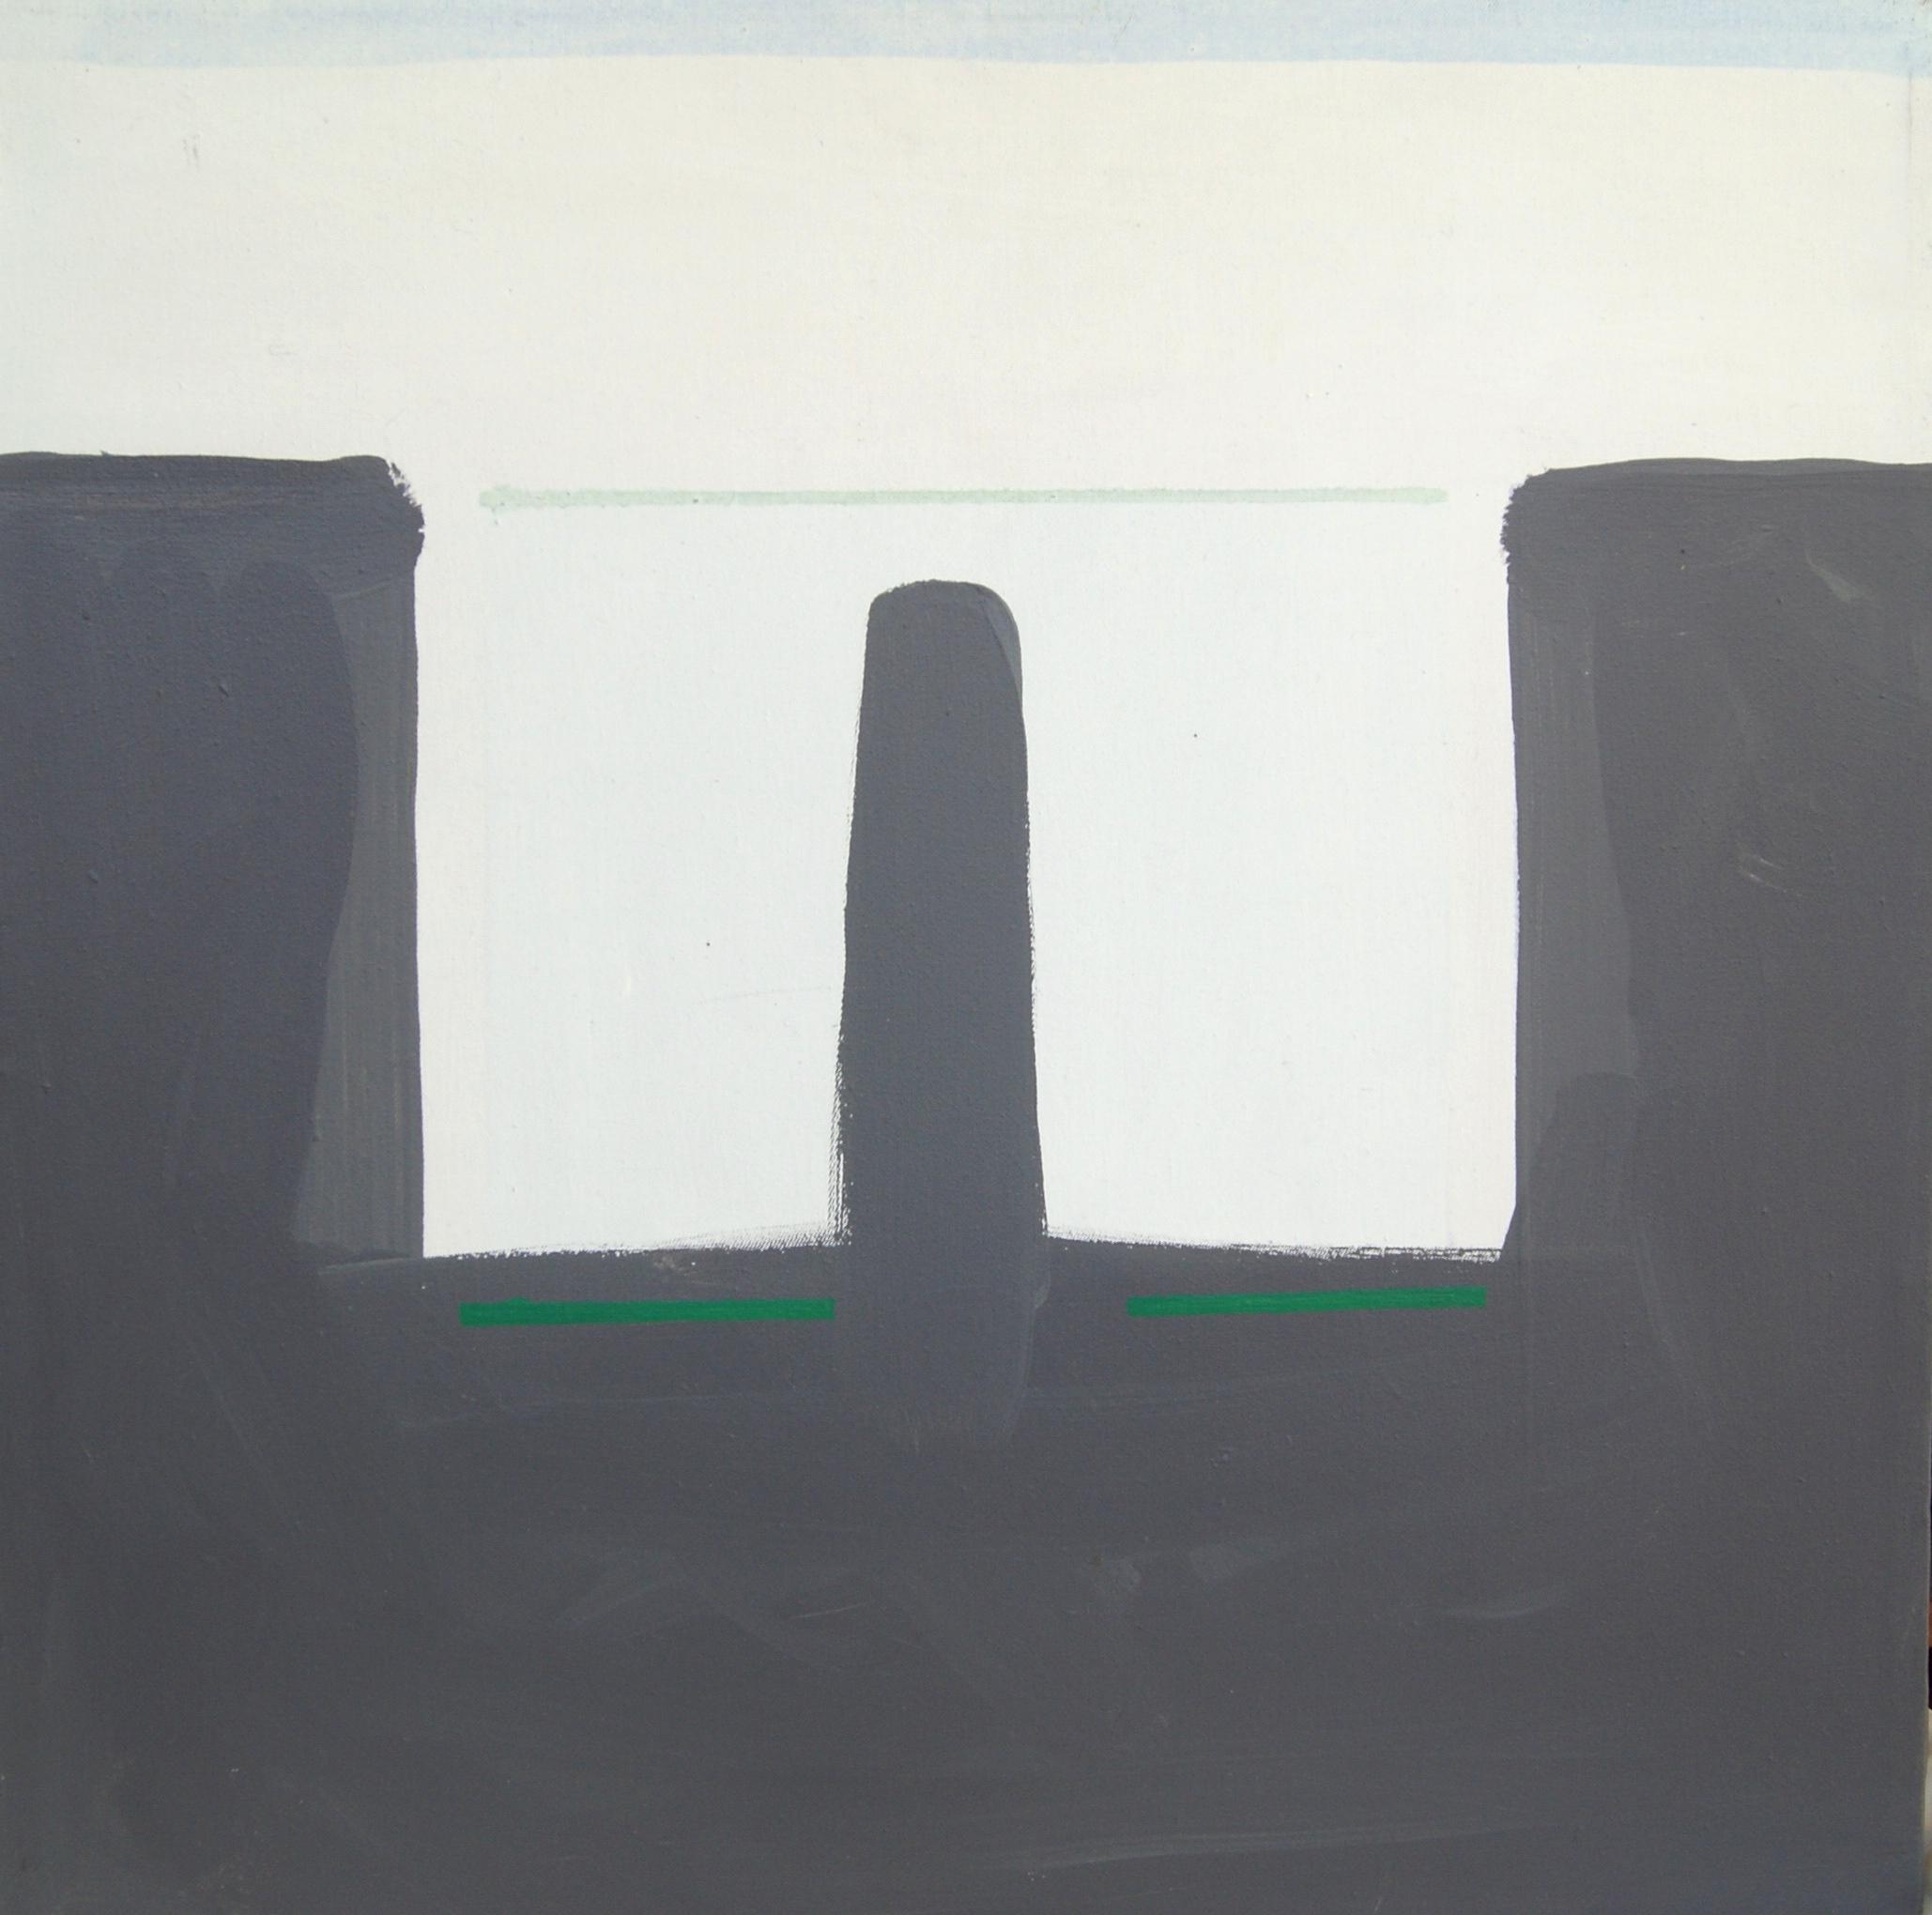 Zonder titel, 1995, 50x50cm, acryl op katoen